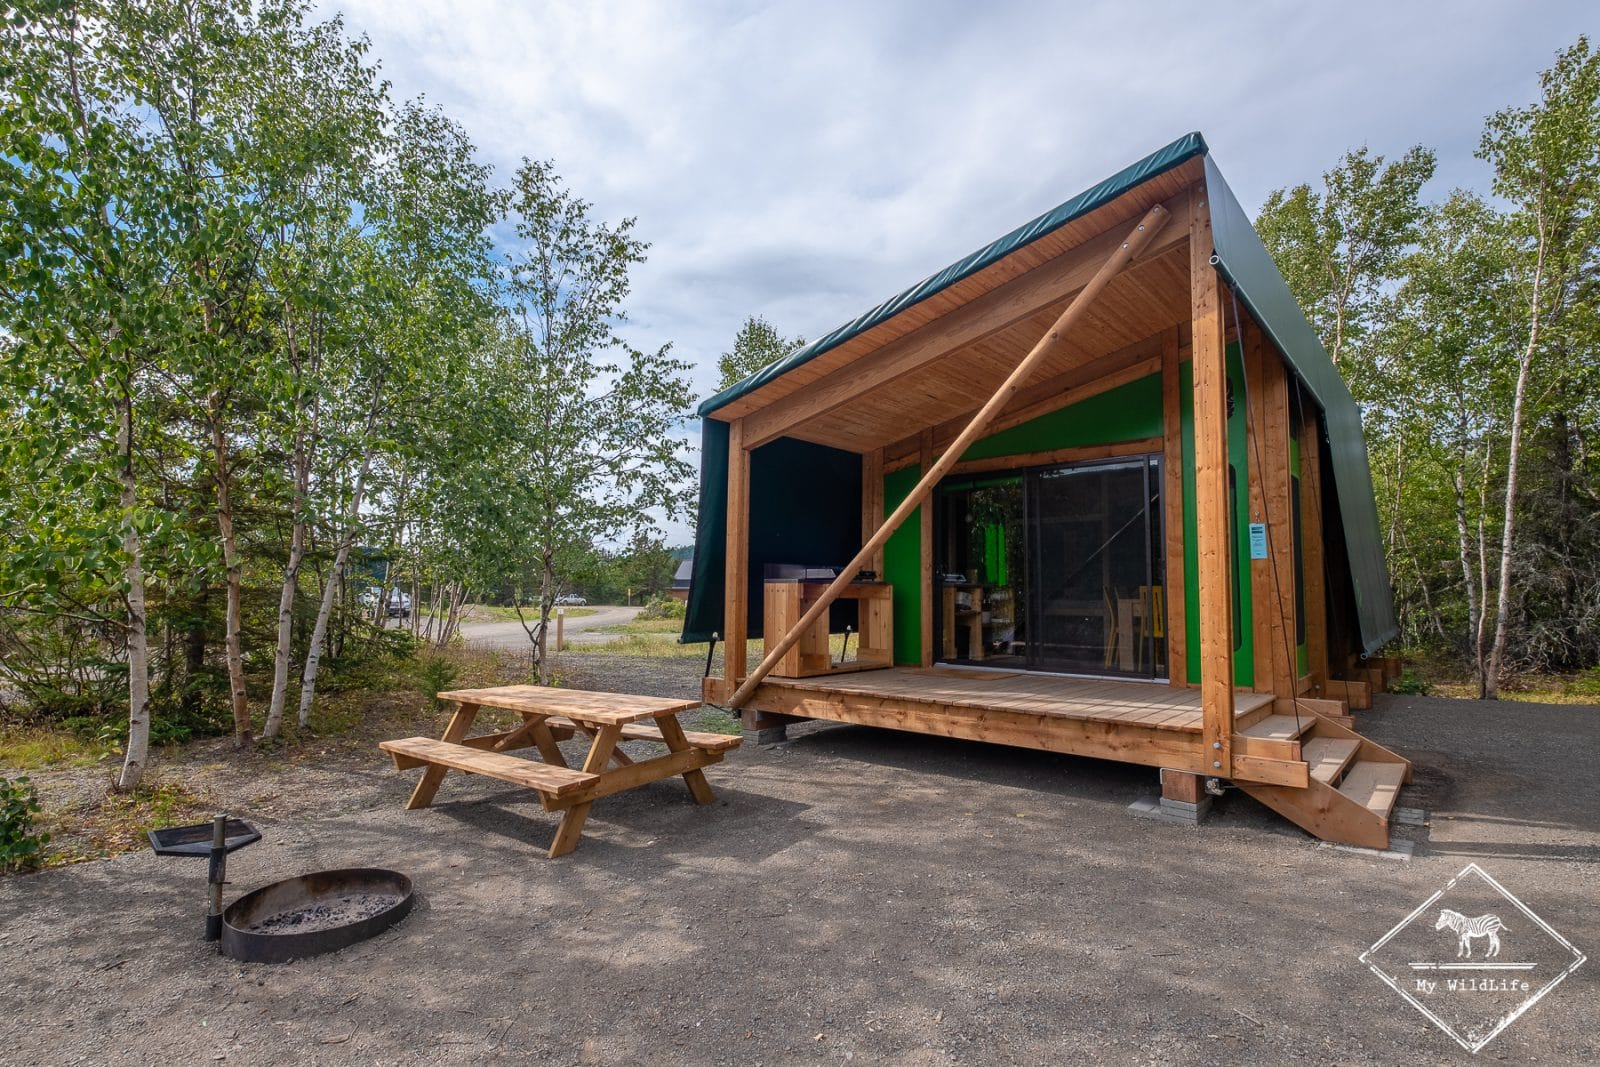 Prêt à camper, Parc national du Bic